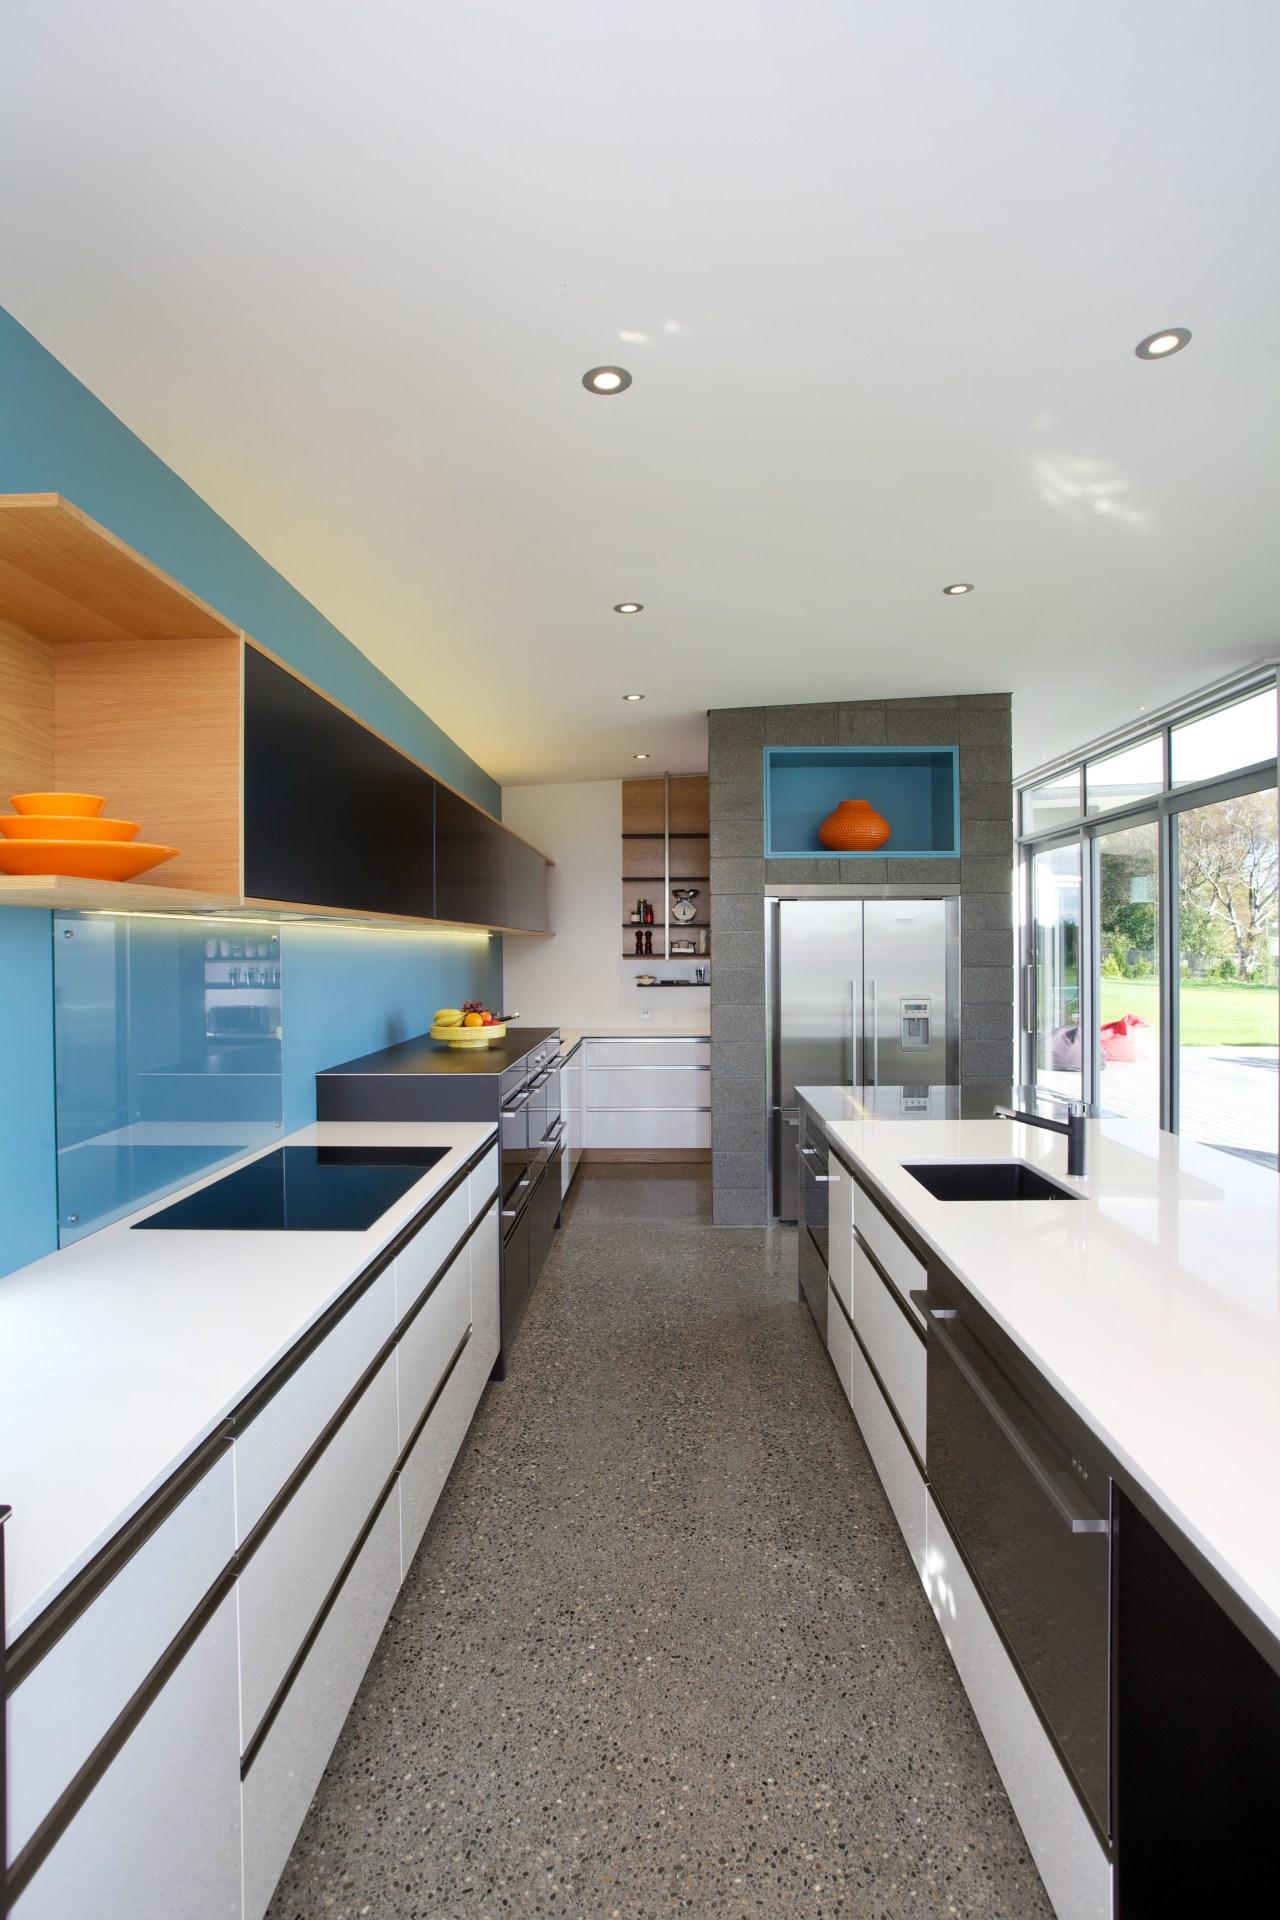 This kitchen designed by Melanie Craig Design Partners countertop, interior design, kitchen, real estate, room, white, gray